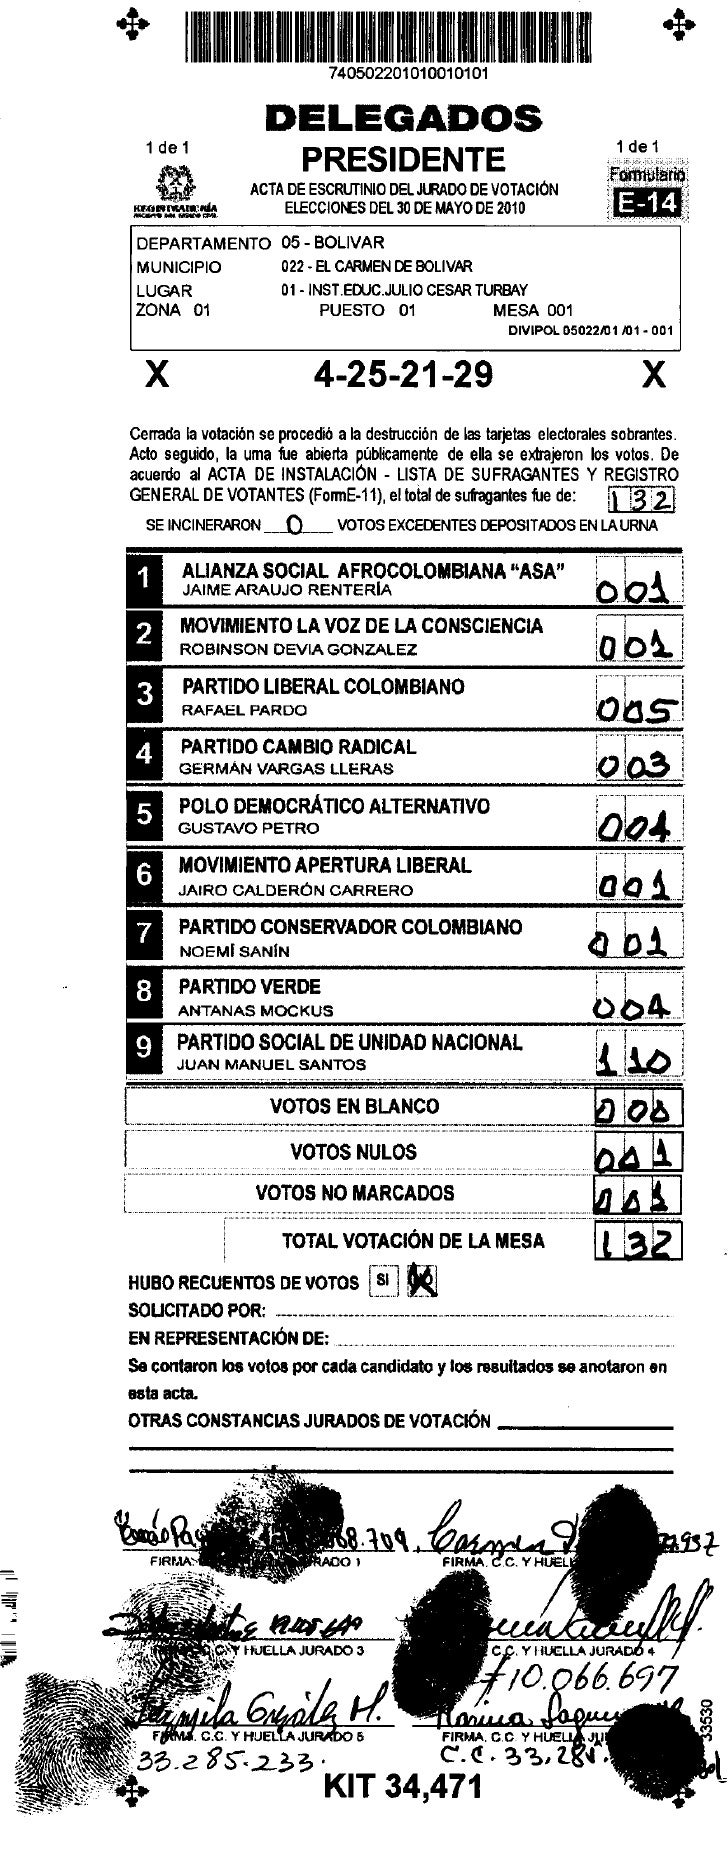 Bolivar el carmen_de_bolivar